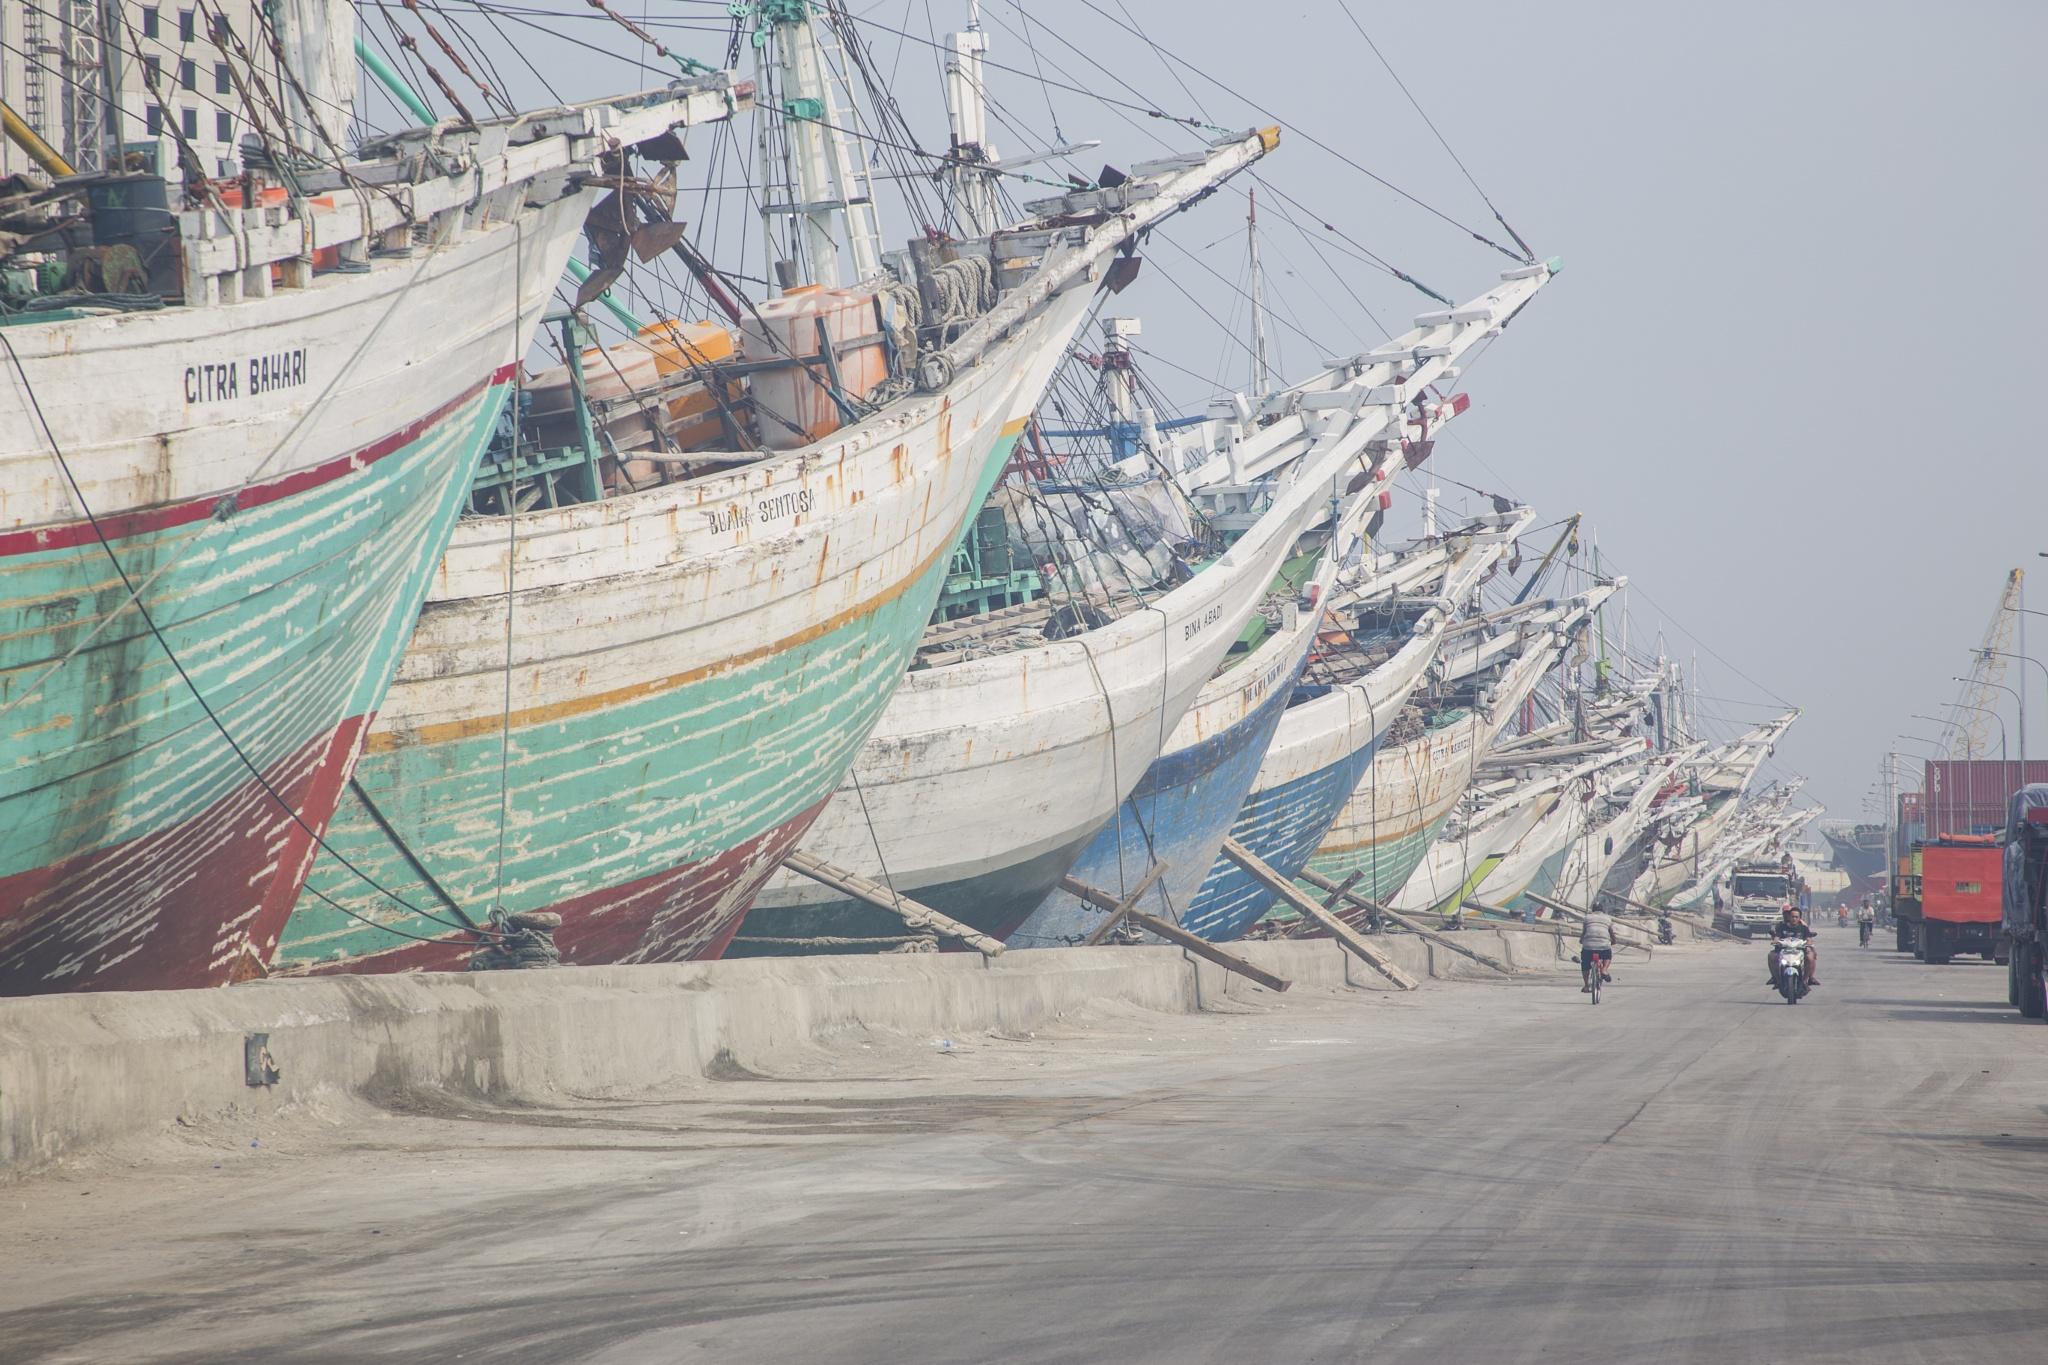 Parkin Ship by Bagaskoro Adimasputro